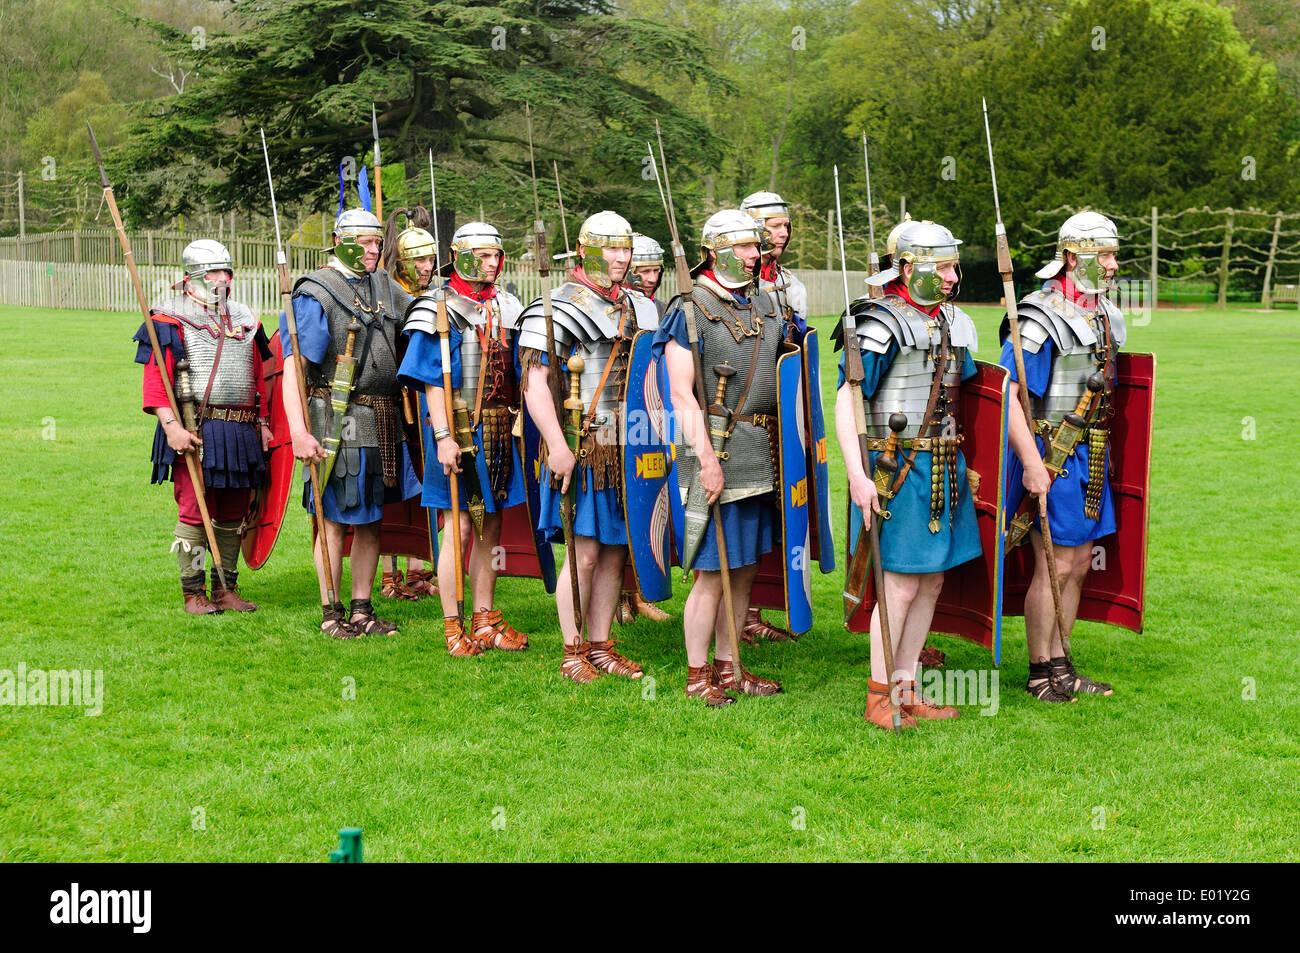 Rufford Abbey Historical Event .Nottinghamshire,UK. - Stock Image